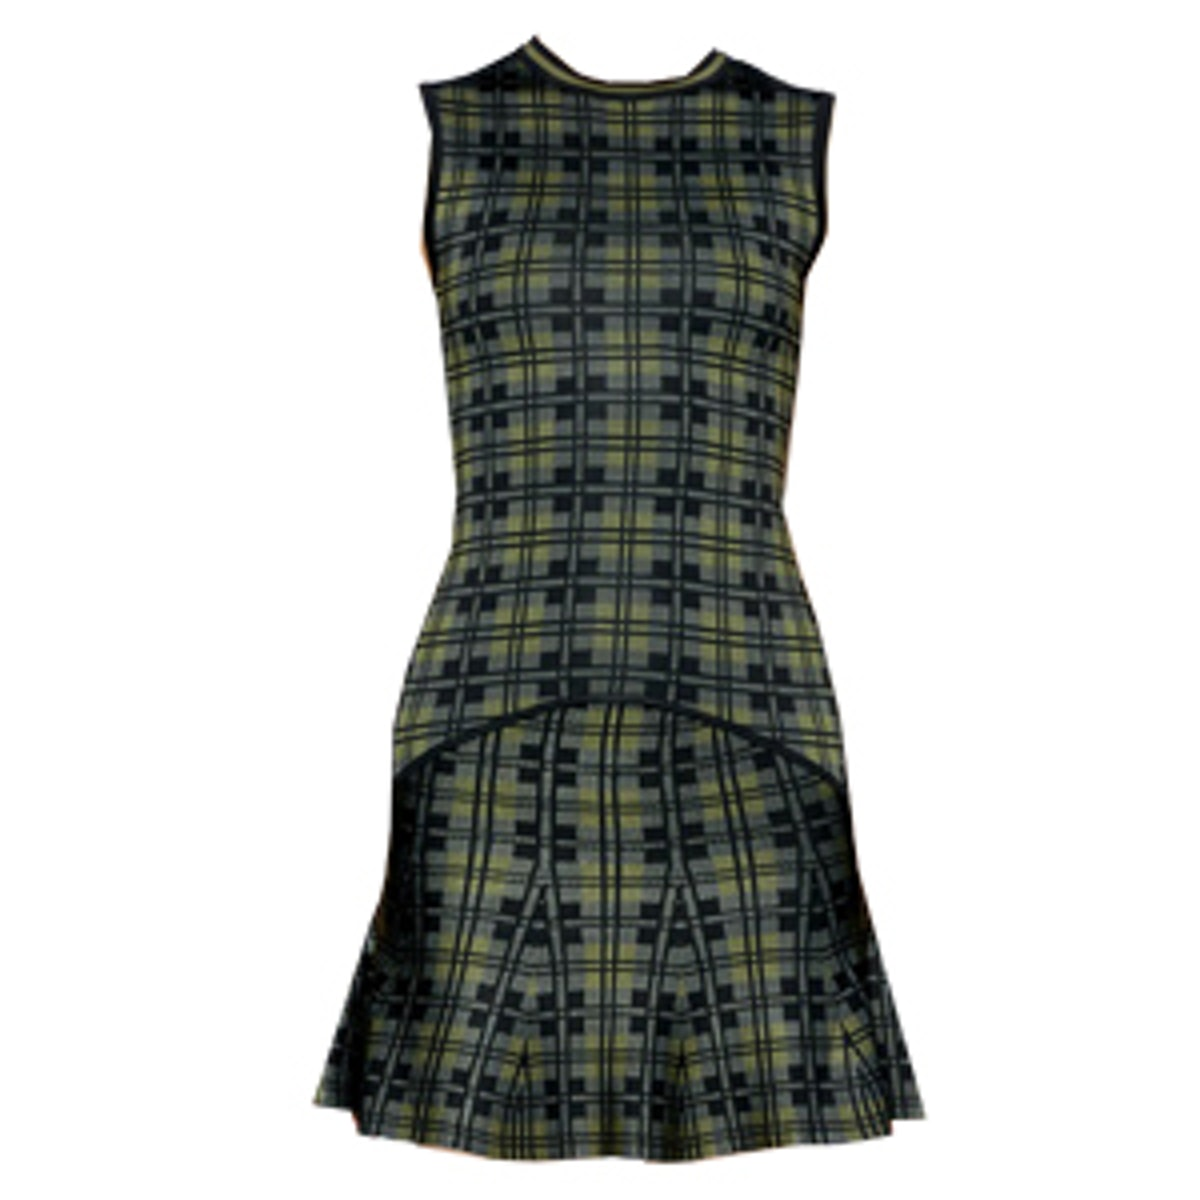 Drop Waist Plaid Dress